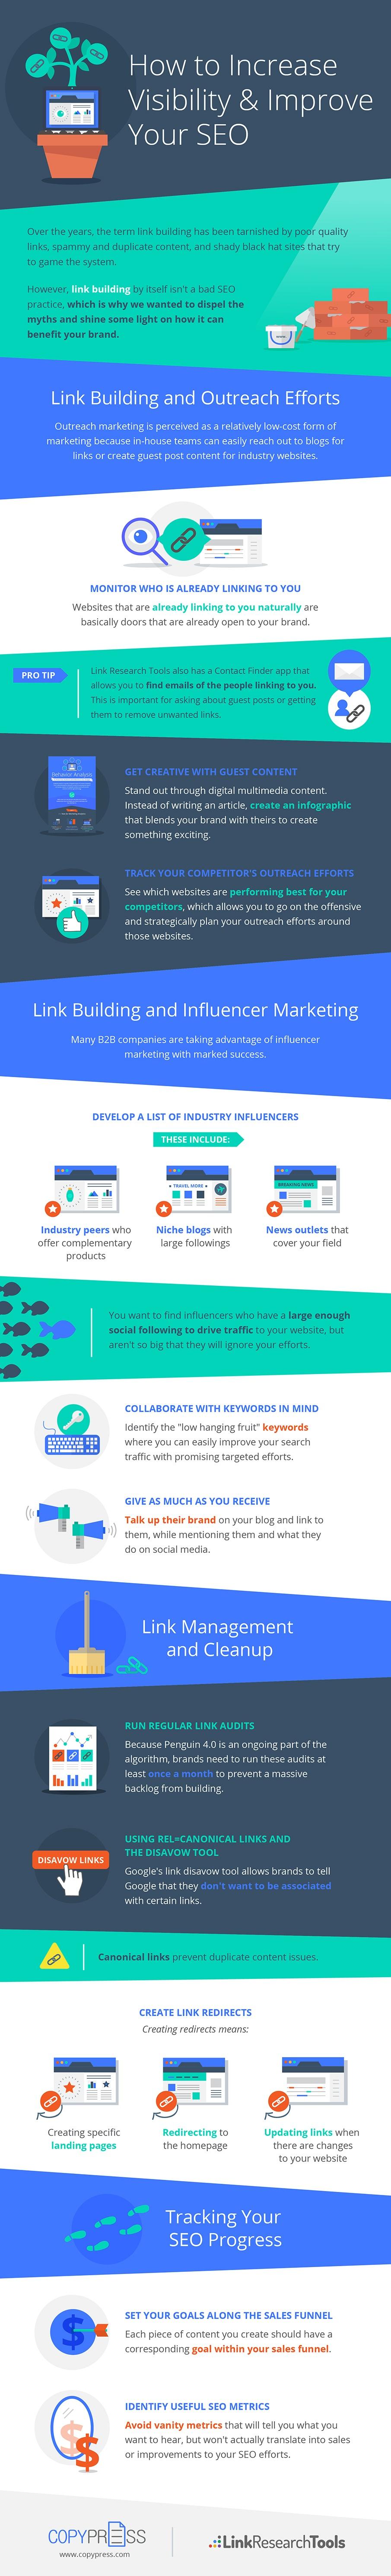 SEO Infographic.jpg